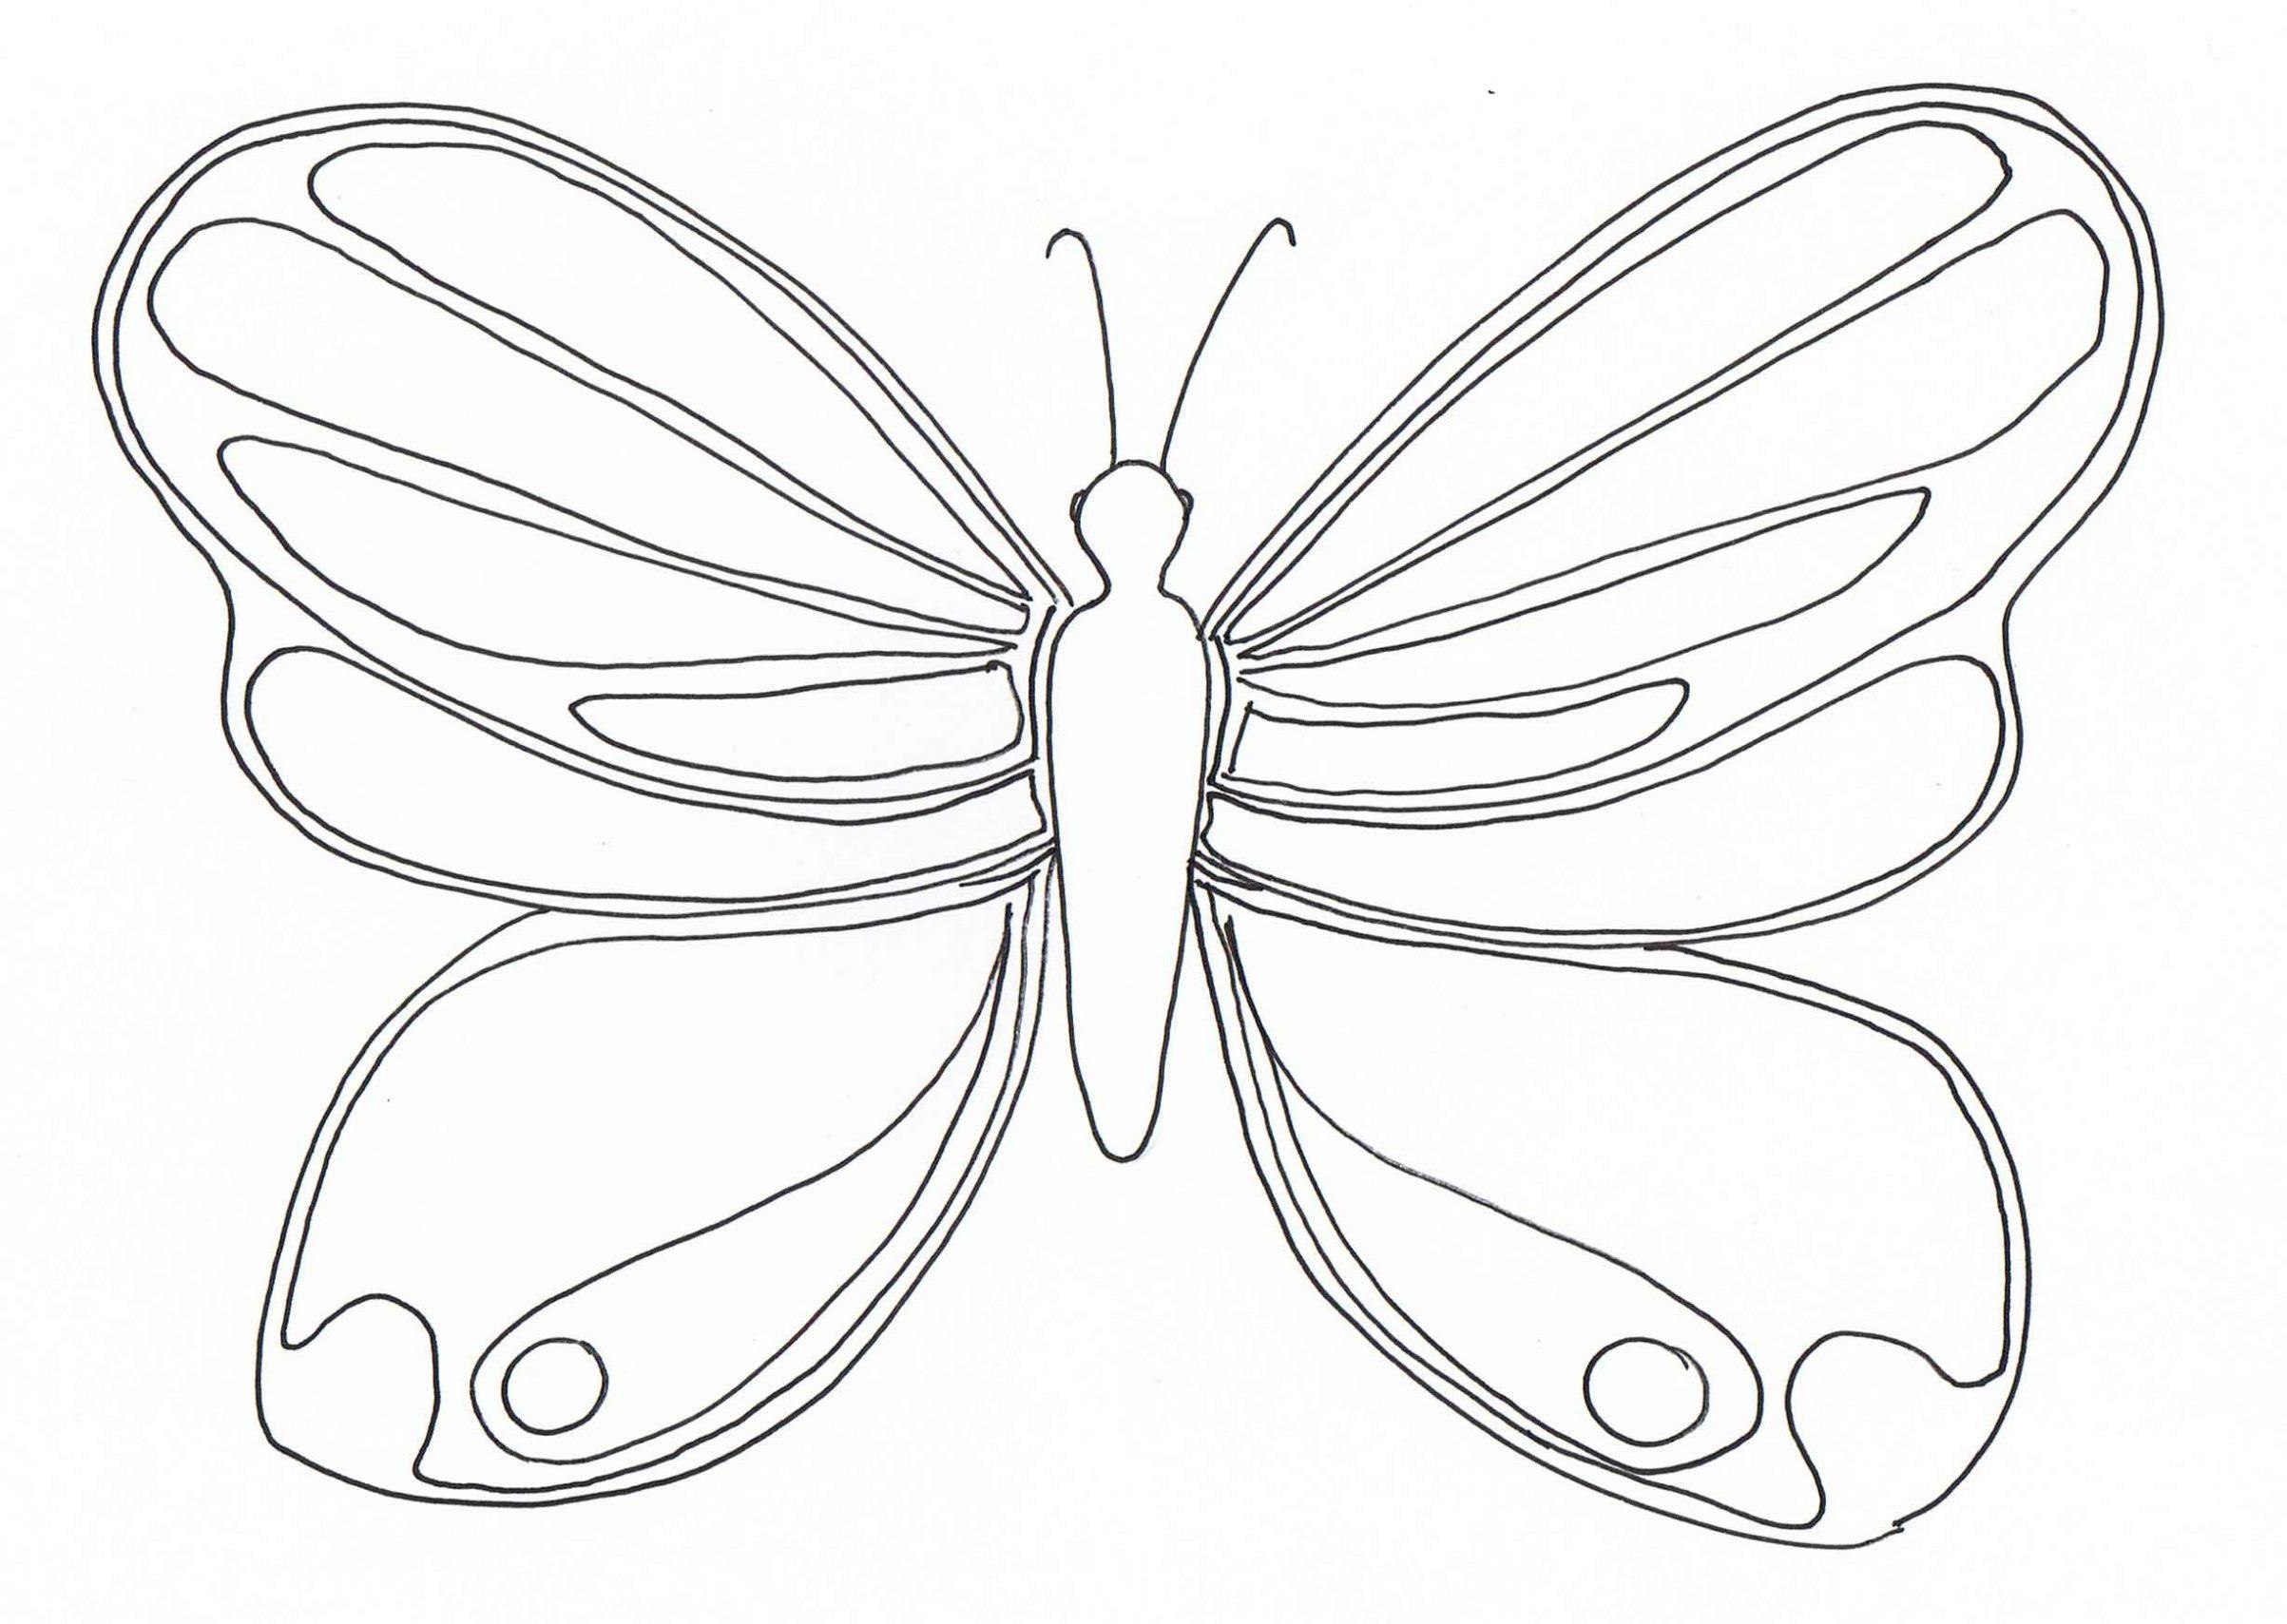 Dibujo De Mariposas Para Colorear Dibujos Infantiles De Mariposas